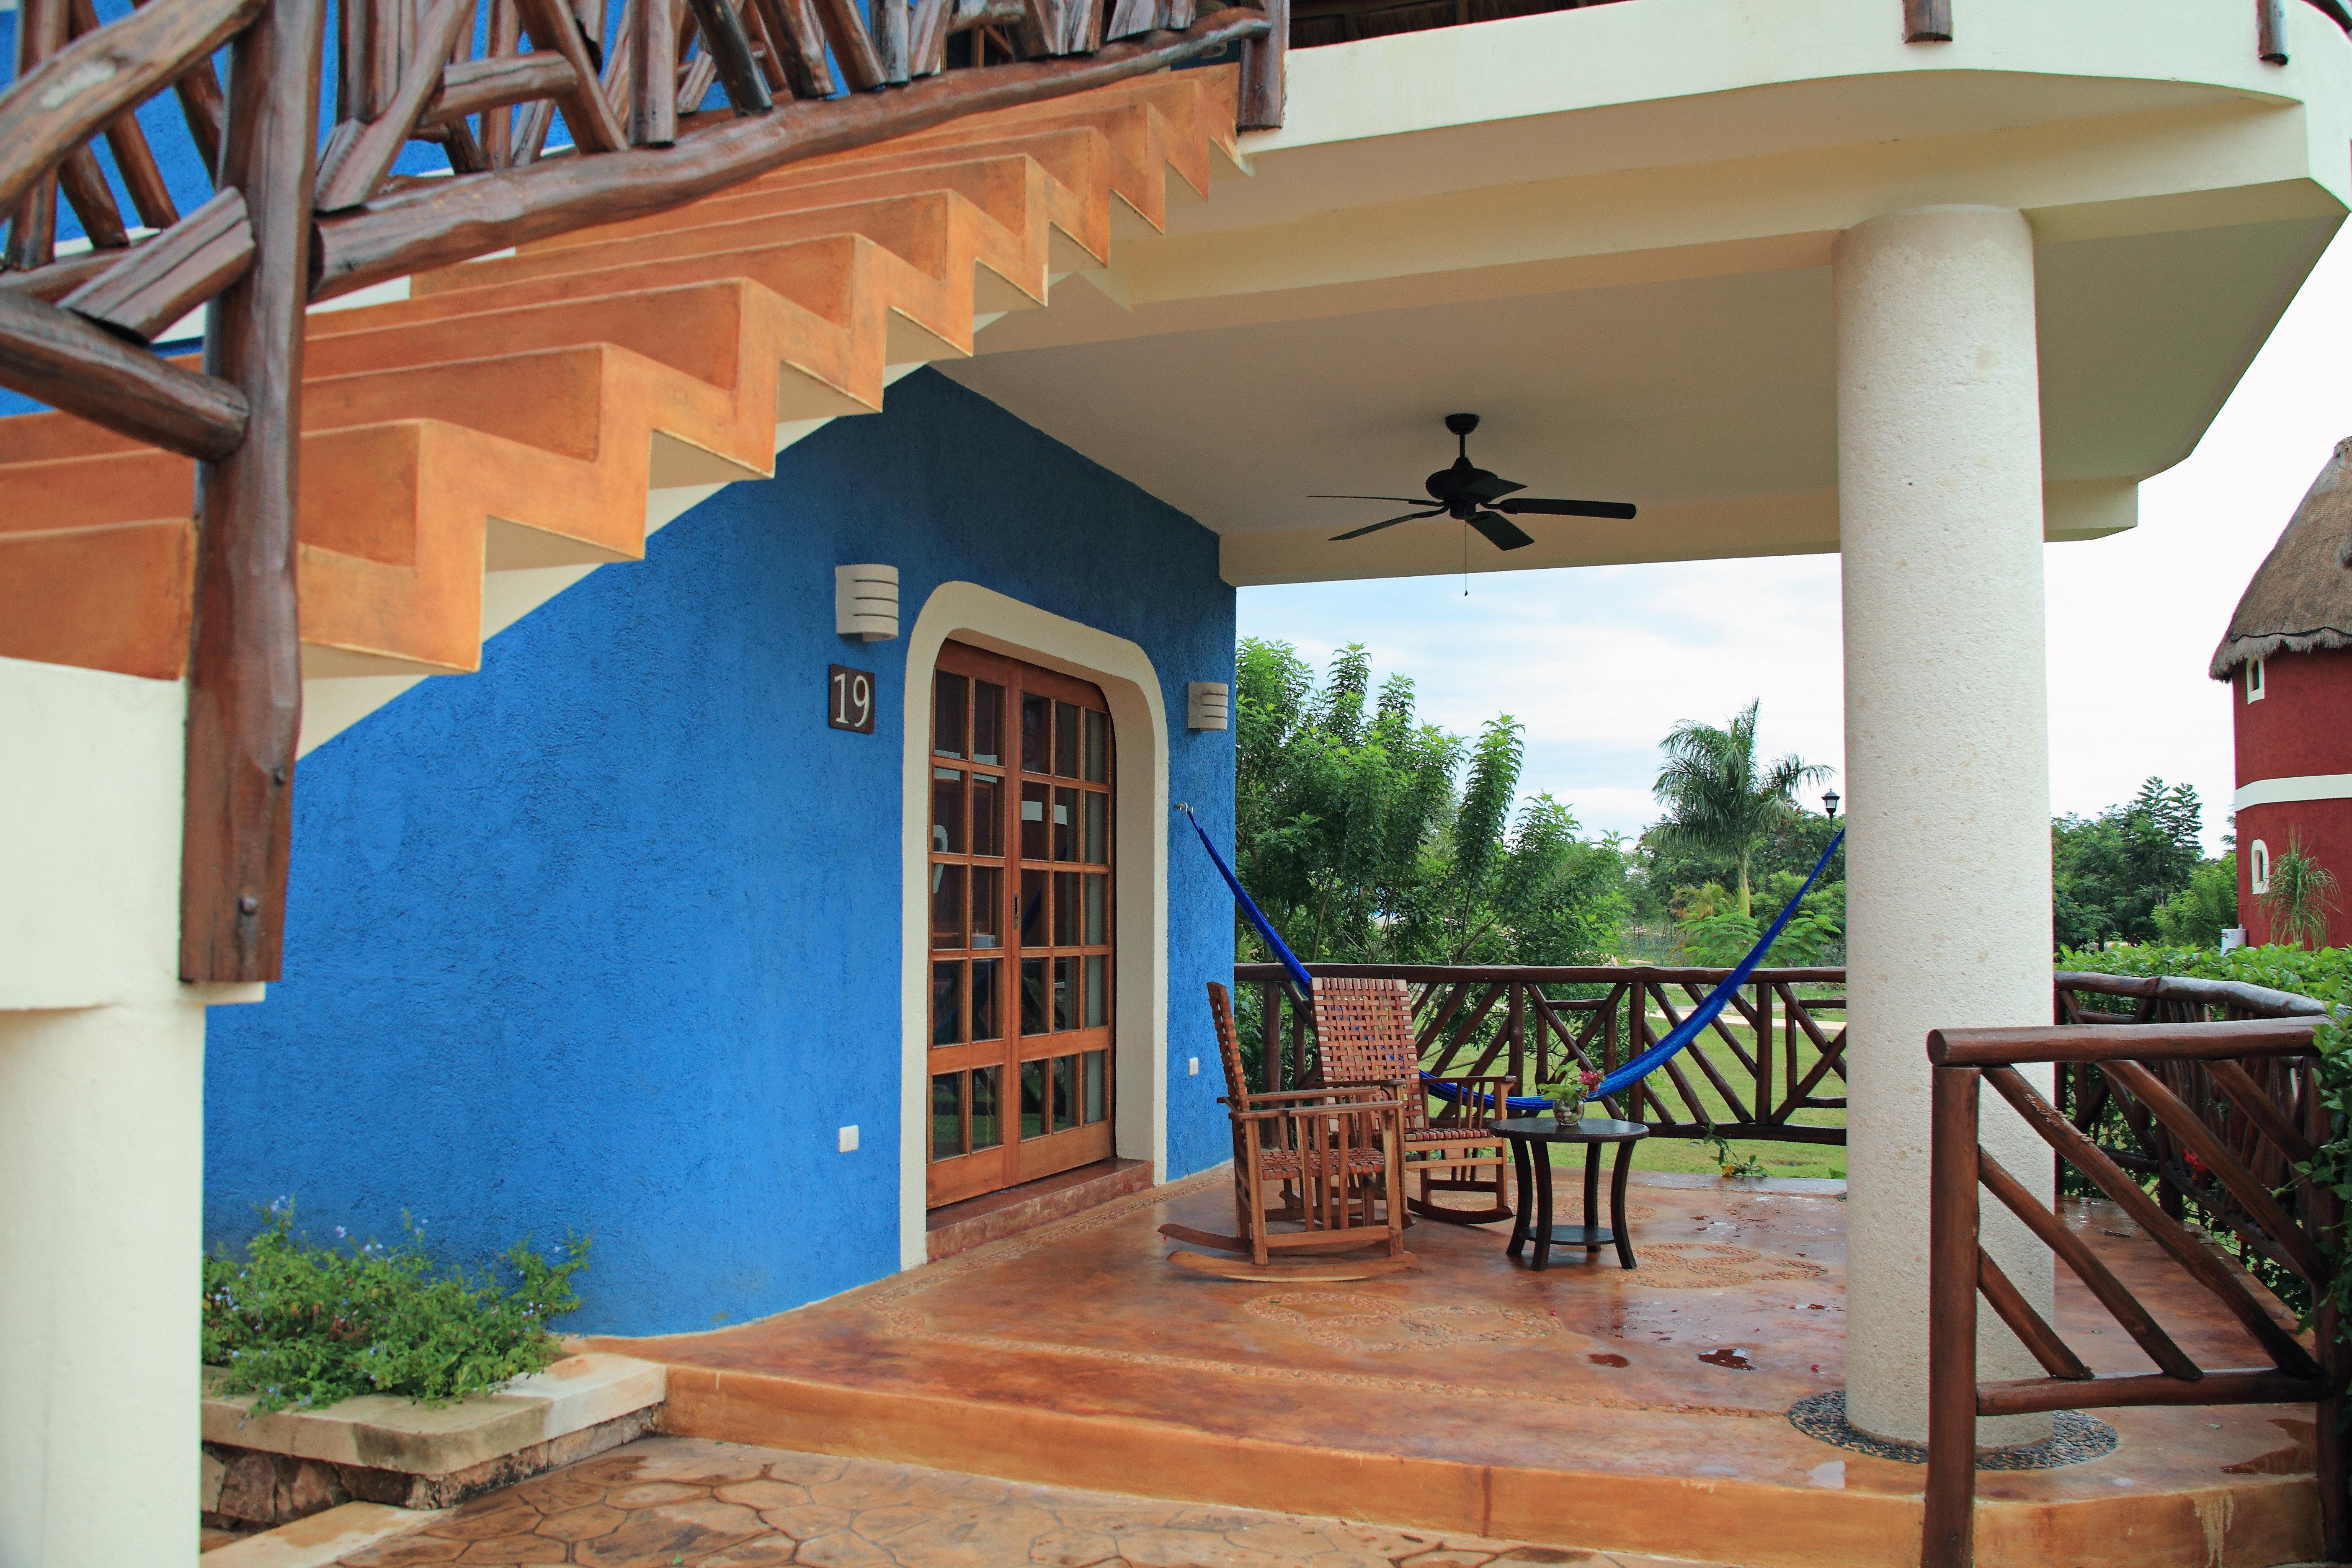 Buildings Exterior Tropical property house home Villa hacienda porch cottage outdoor structure Resort backyard